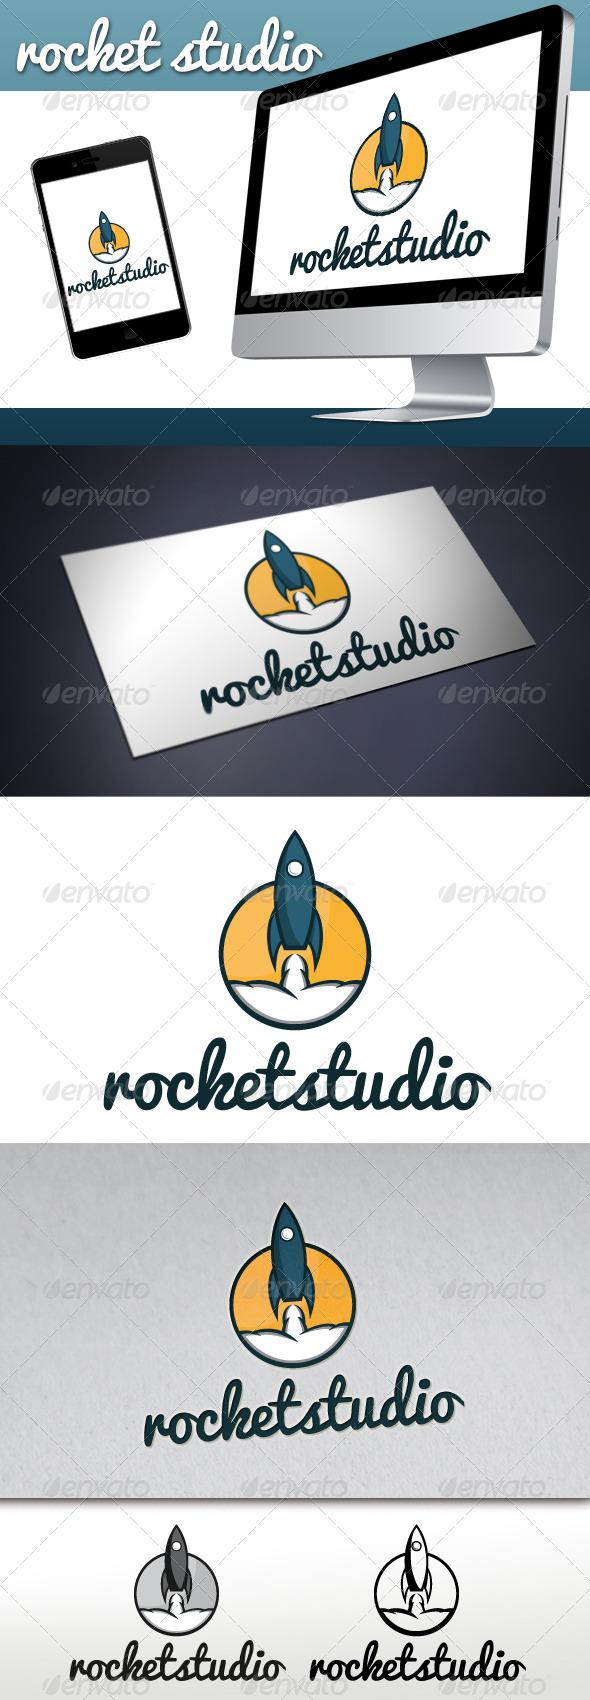 Rocket Studio Logo